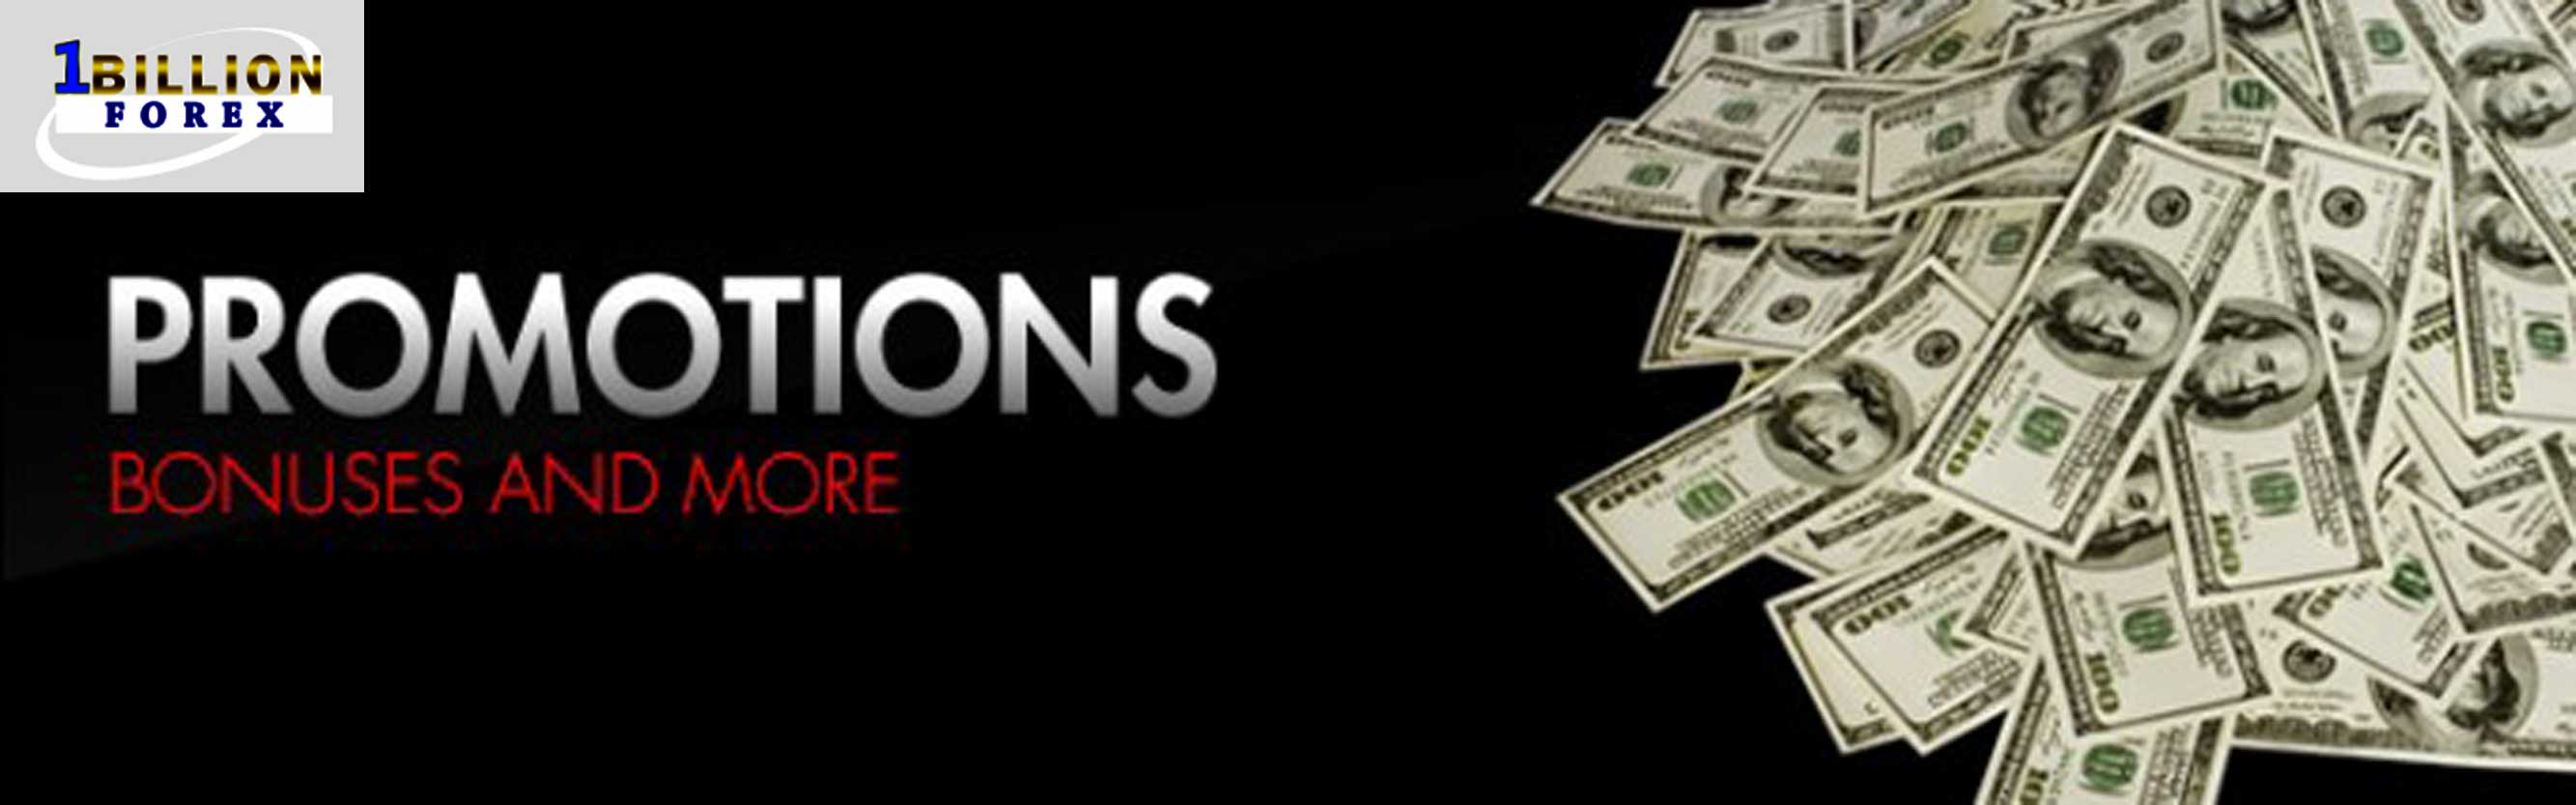 1billionforex deposit bonus